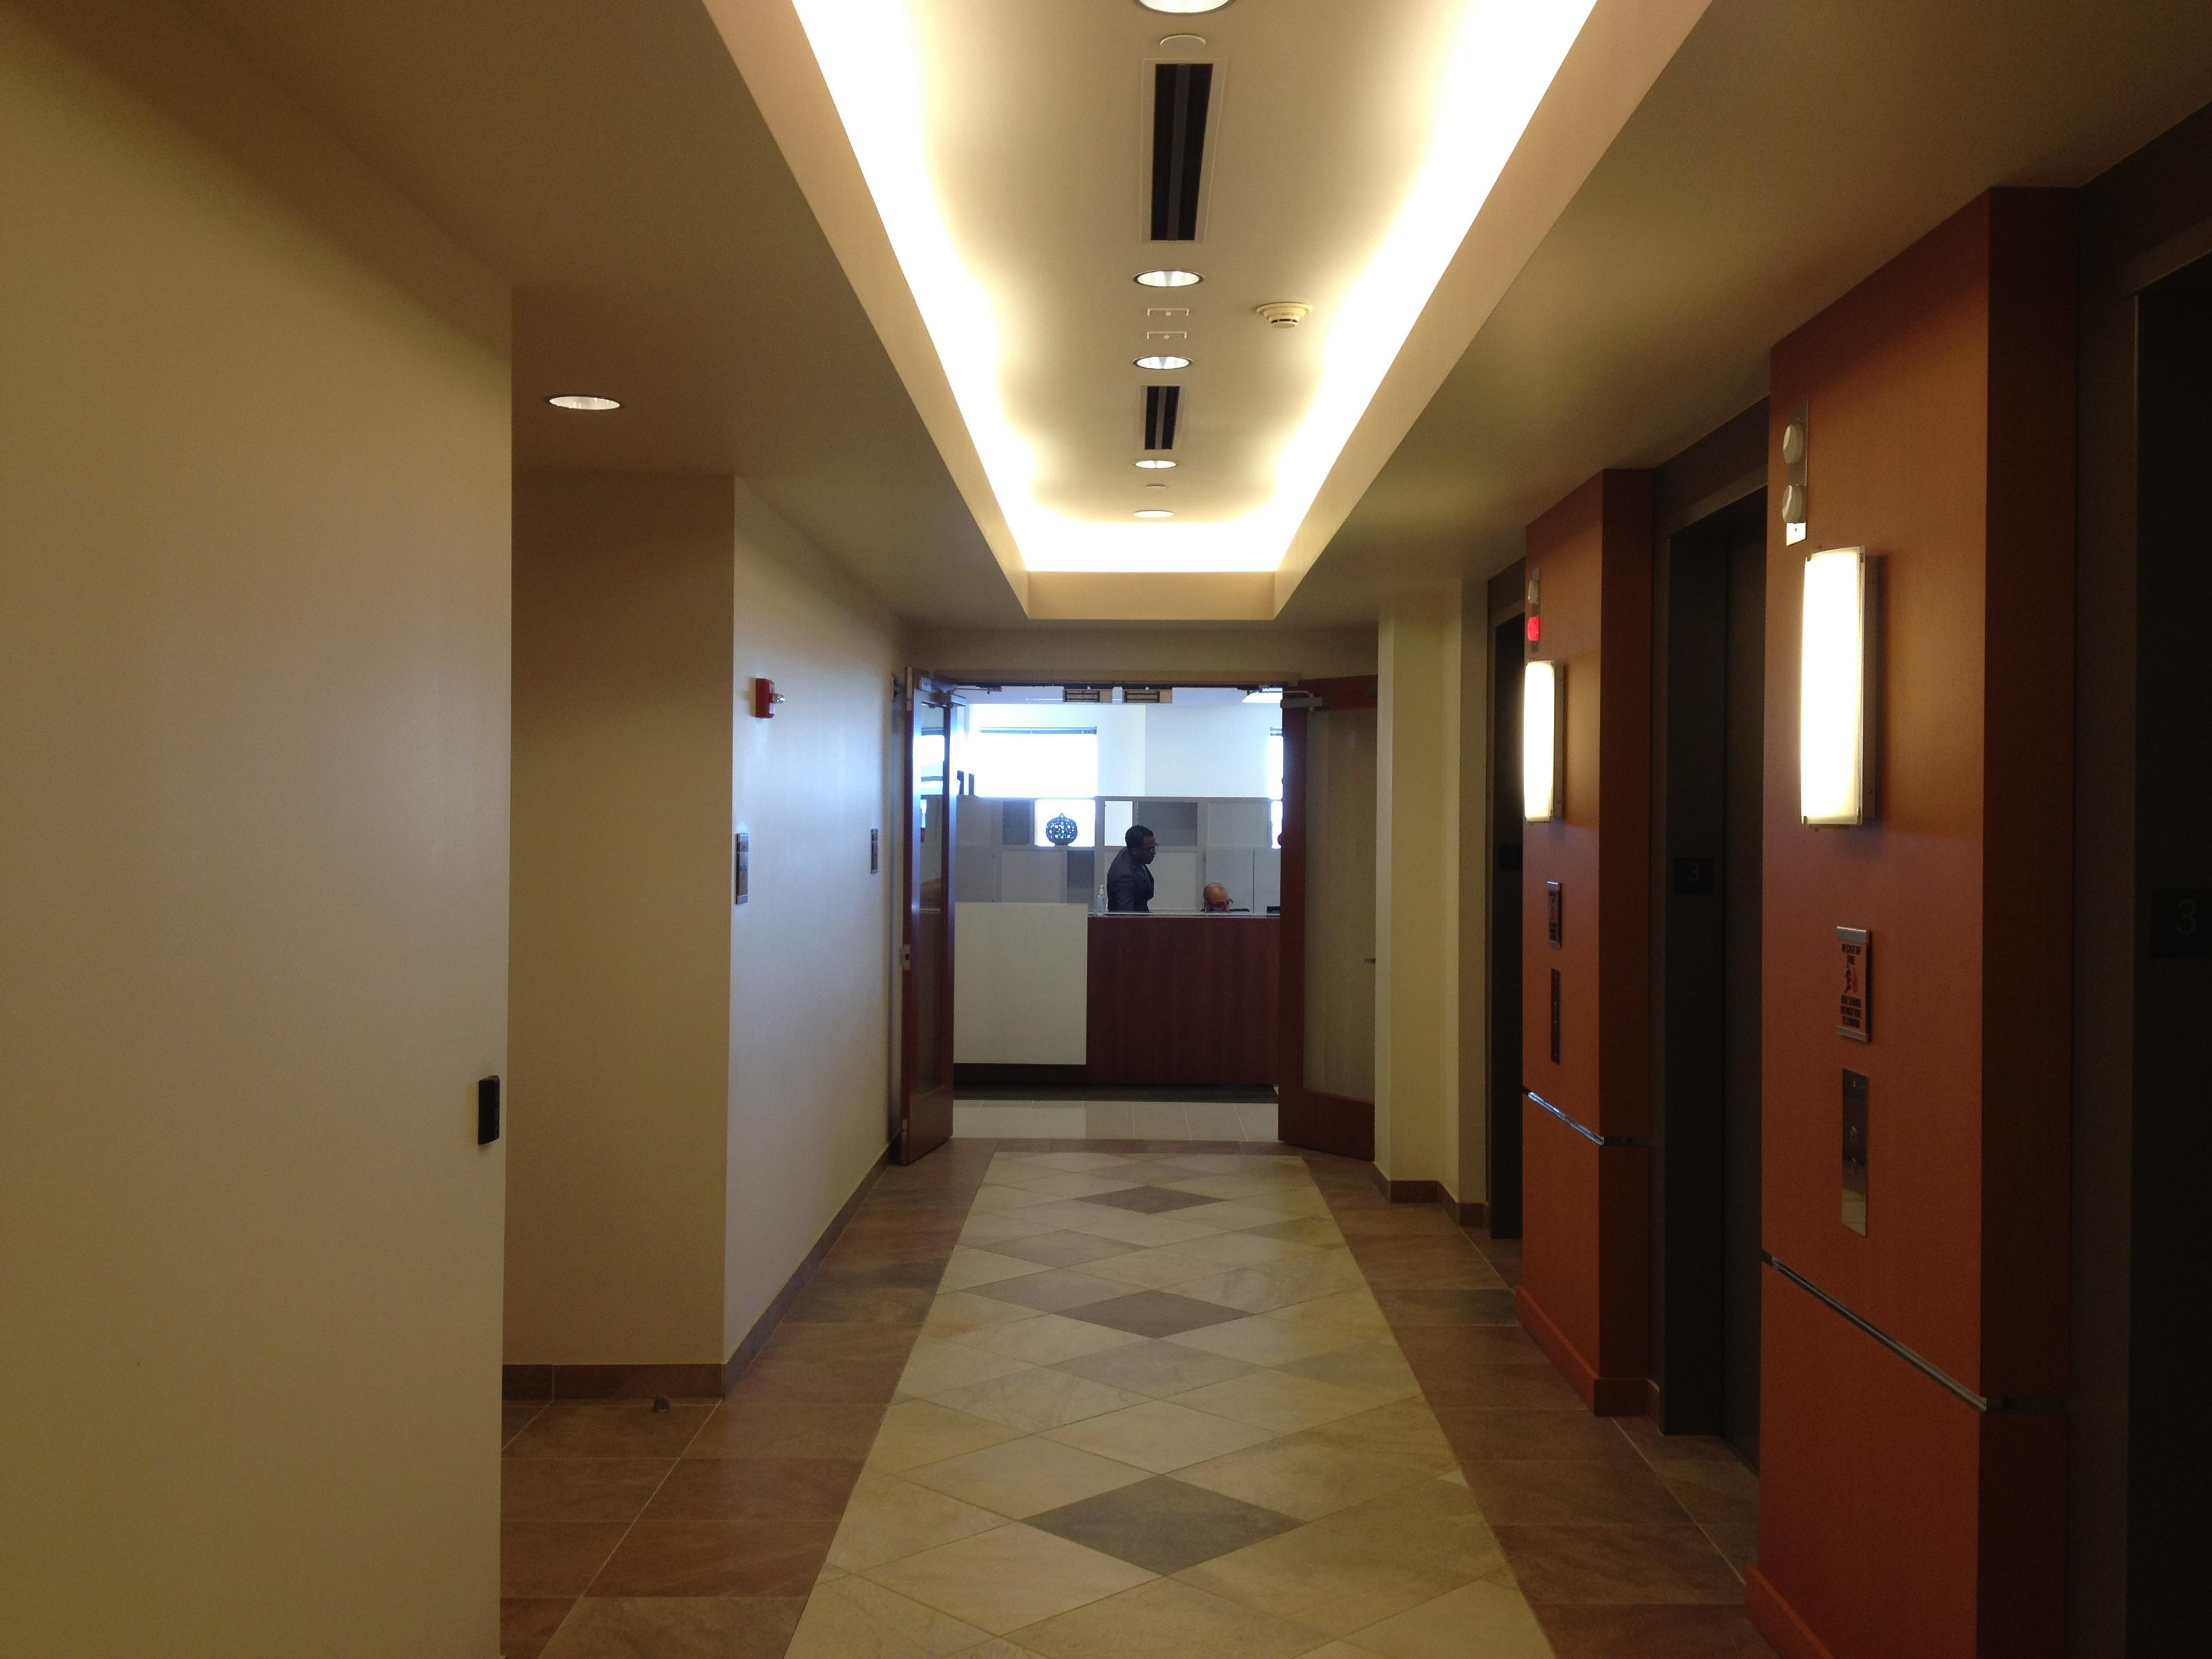 Hallway to Rapid Health Response